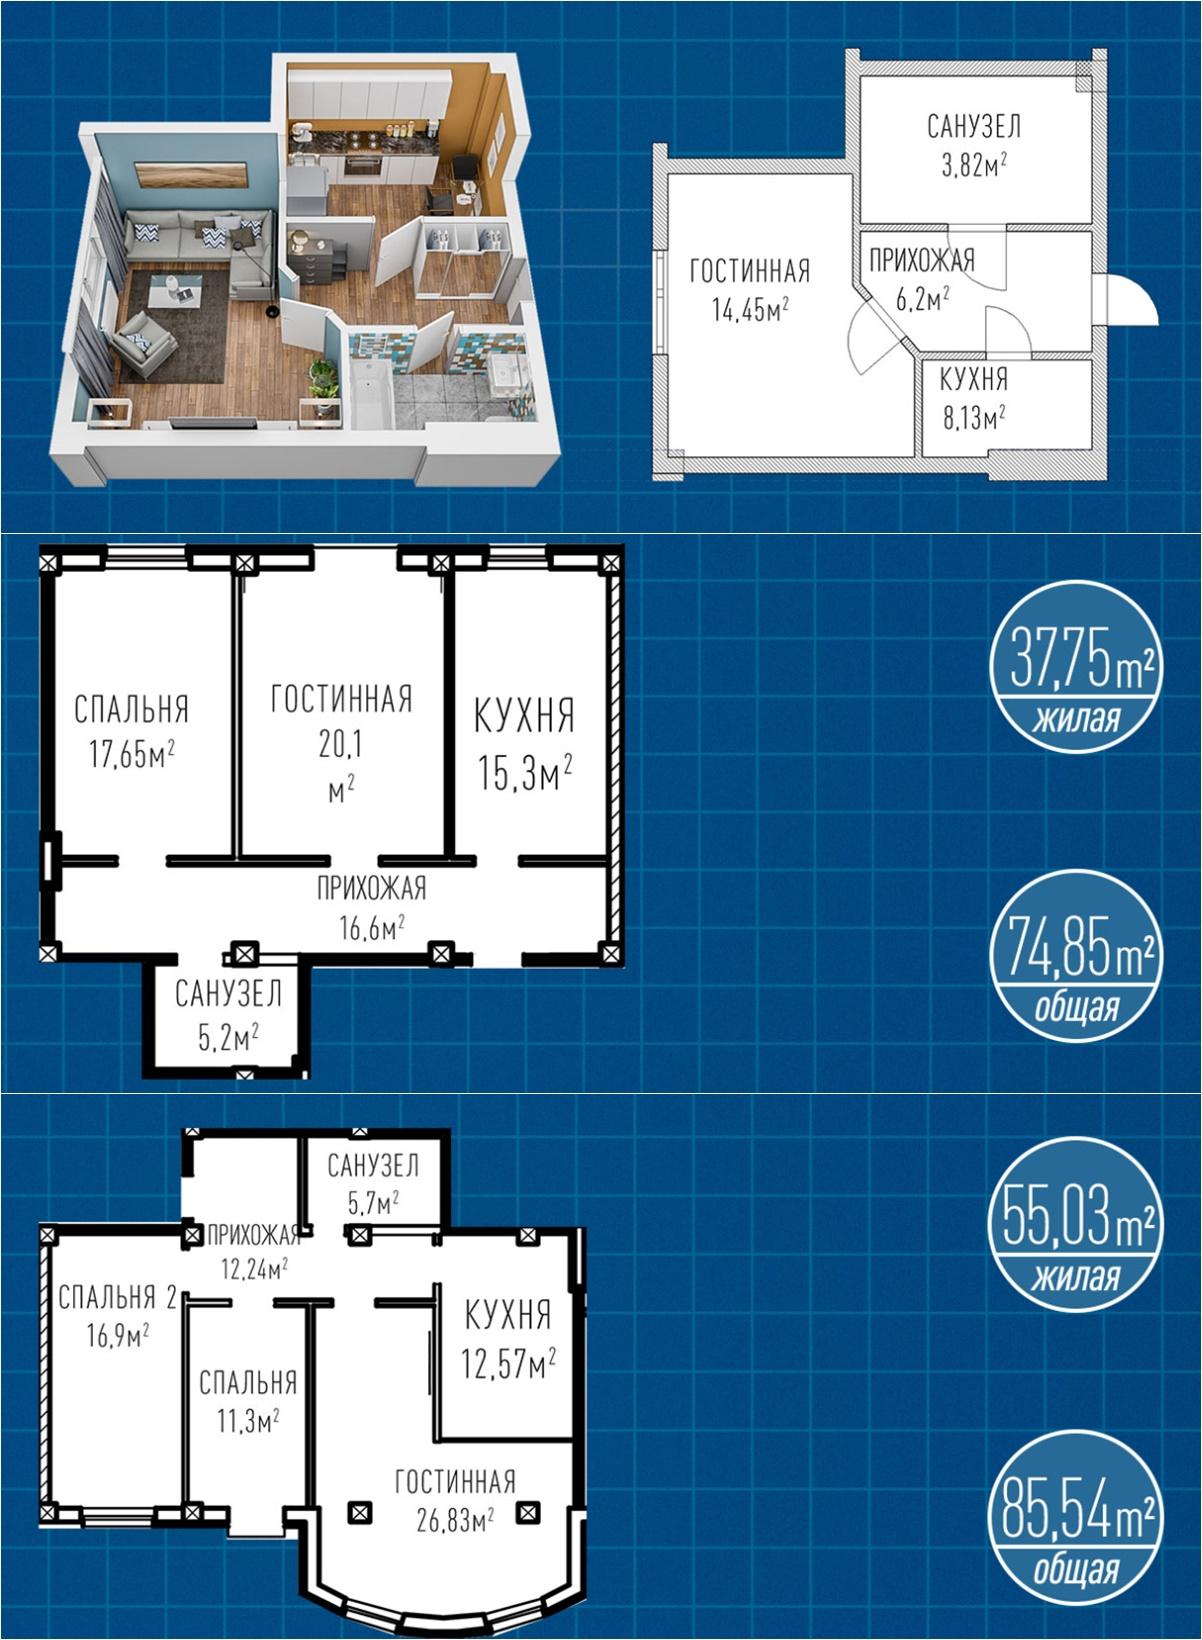 ЖК Лондон Парк варианты планировок квартир